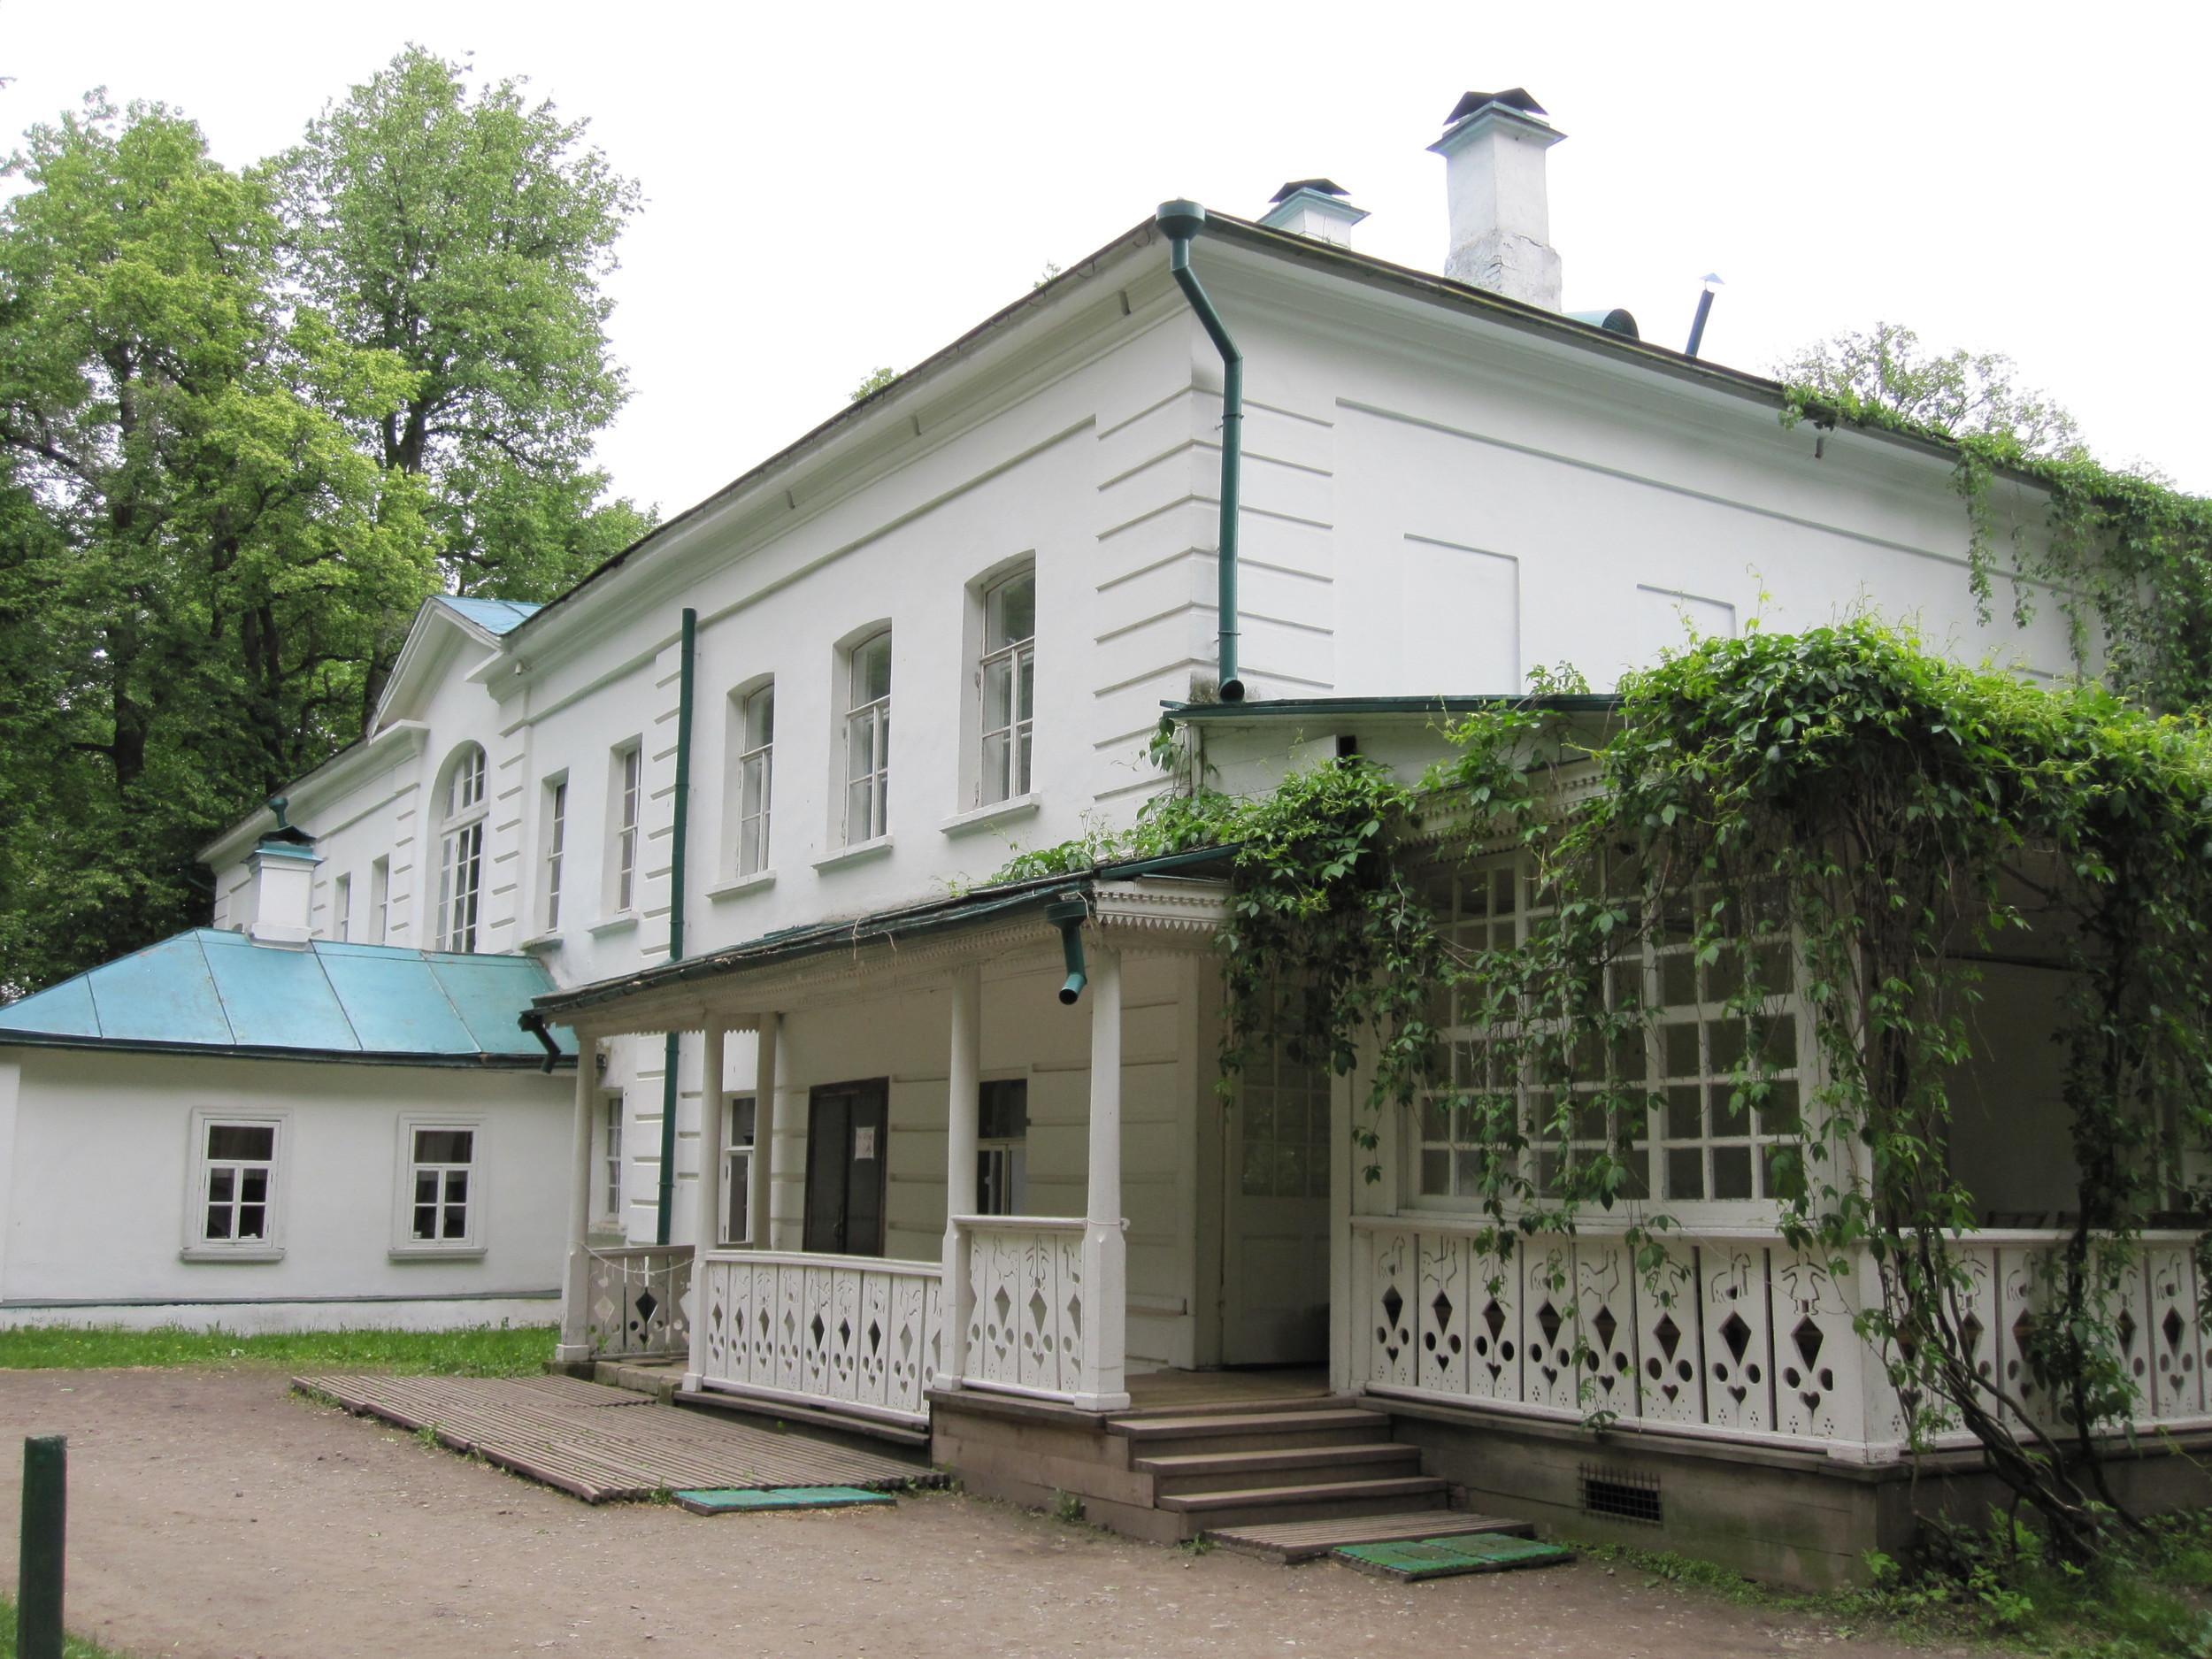 tolstoys-house-at-yasnaya-polyana